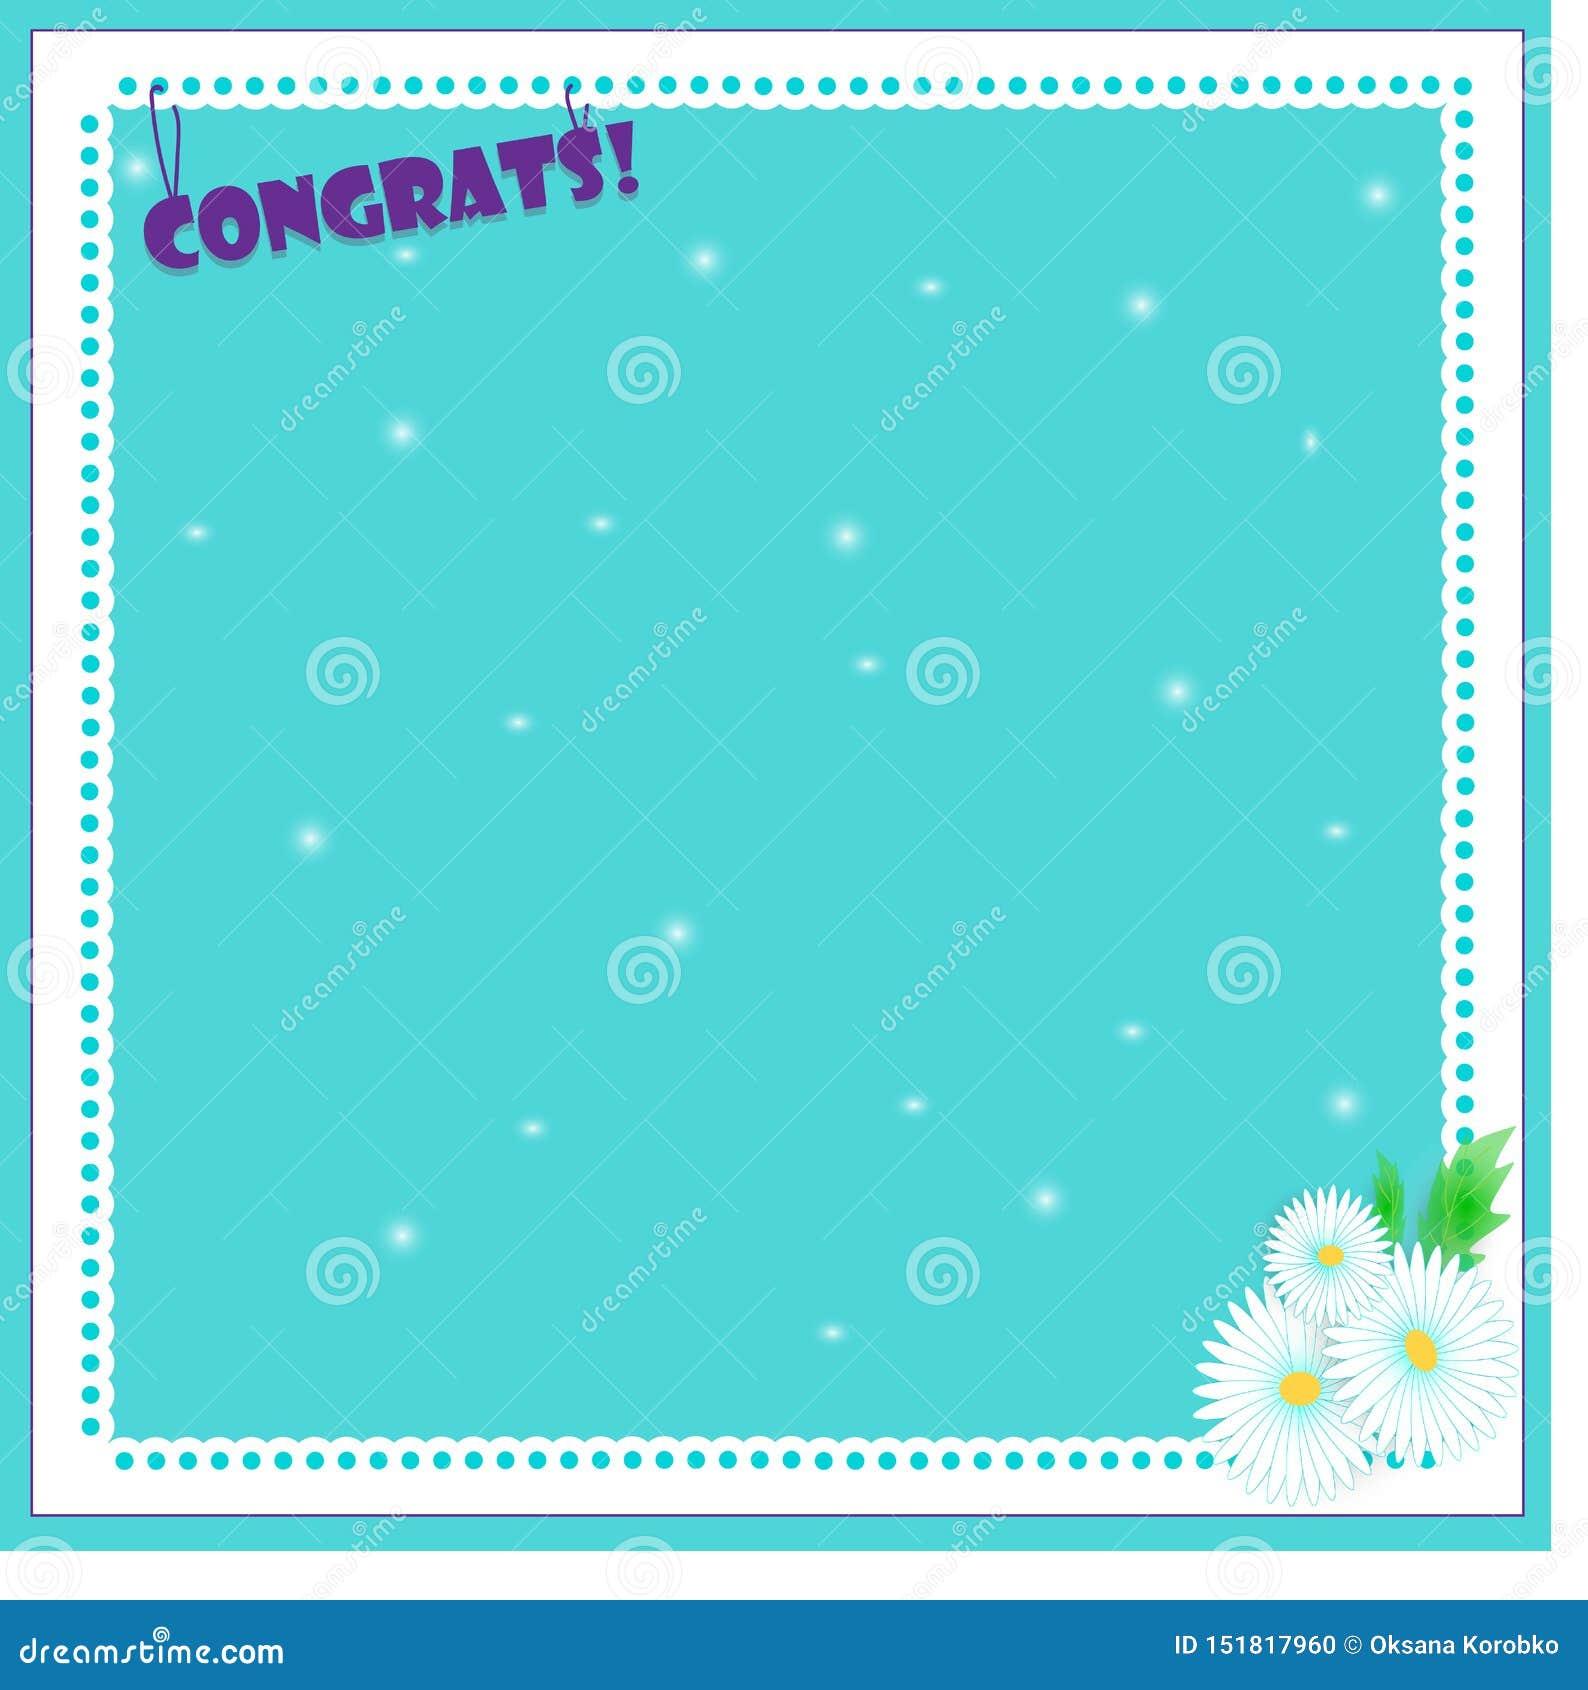 Kamille blauwe achtergrond met kader, vectorillustratie